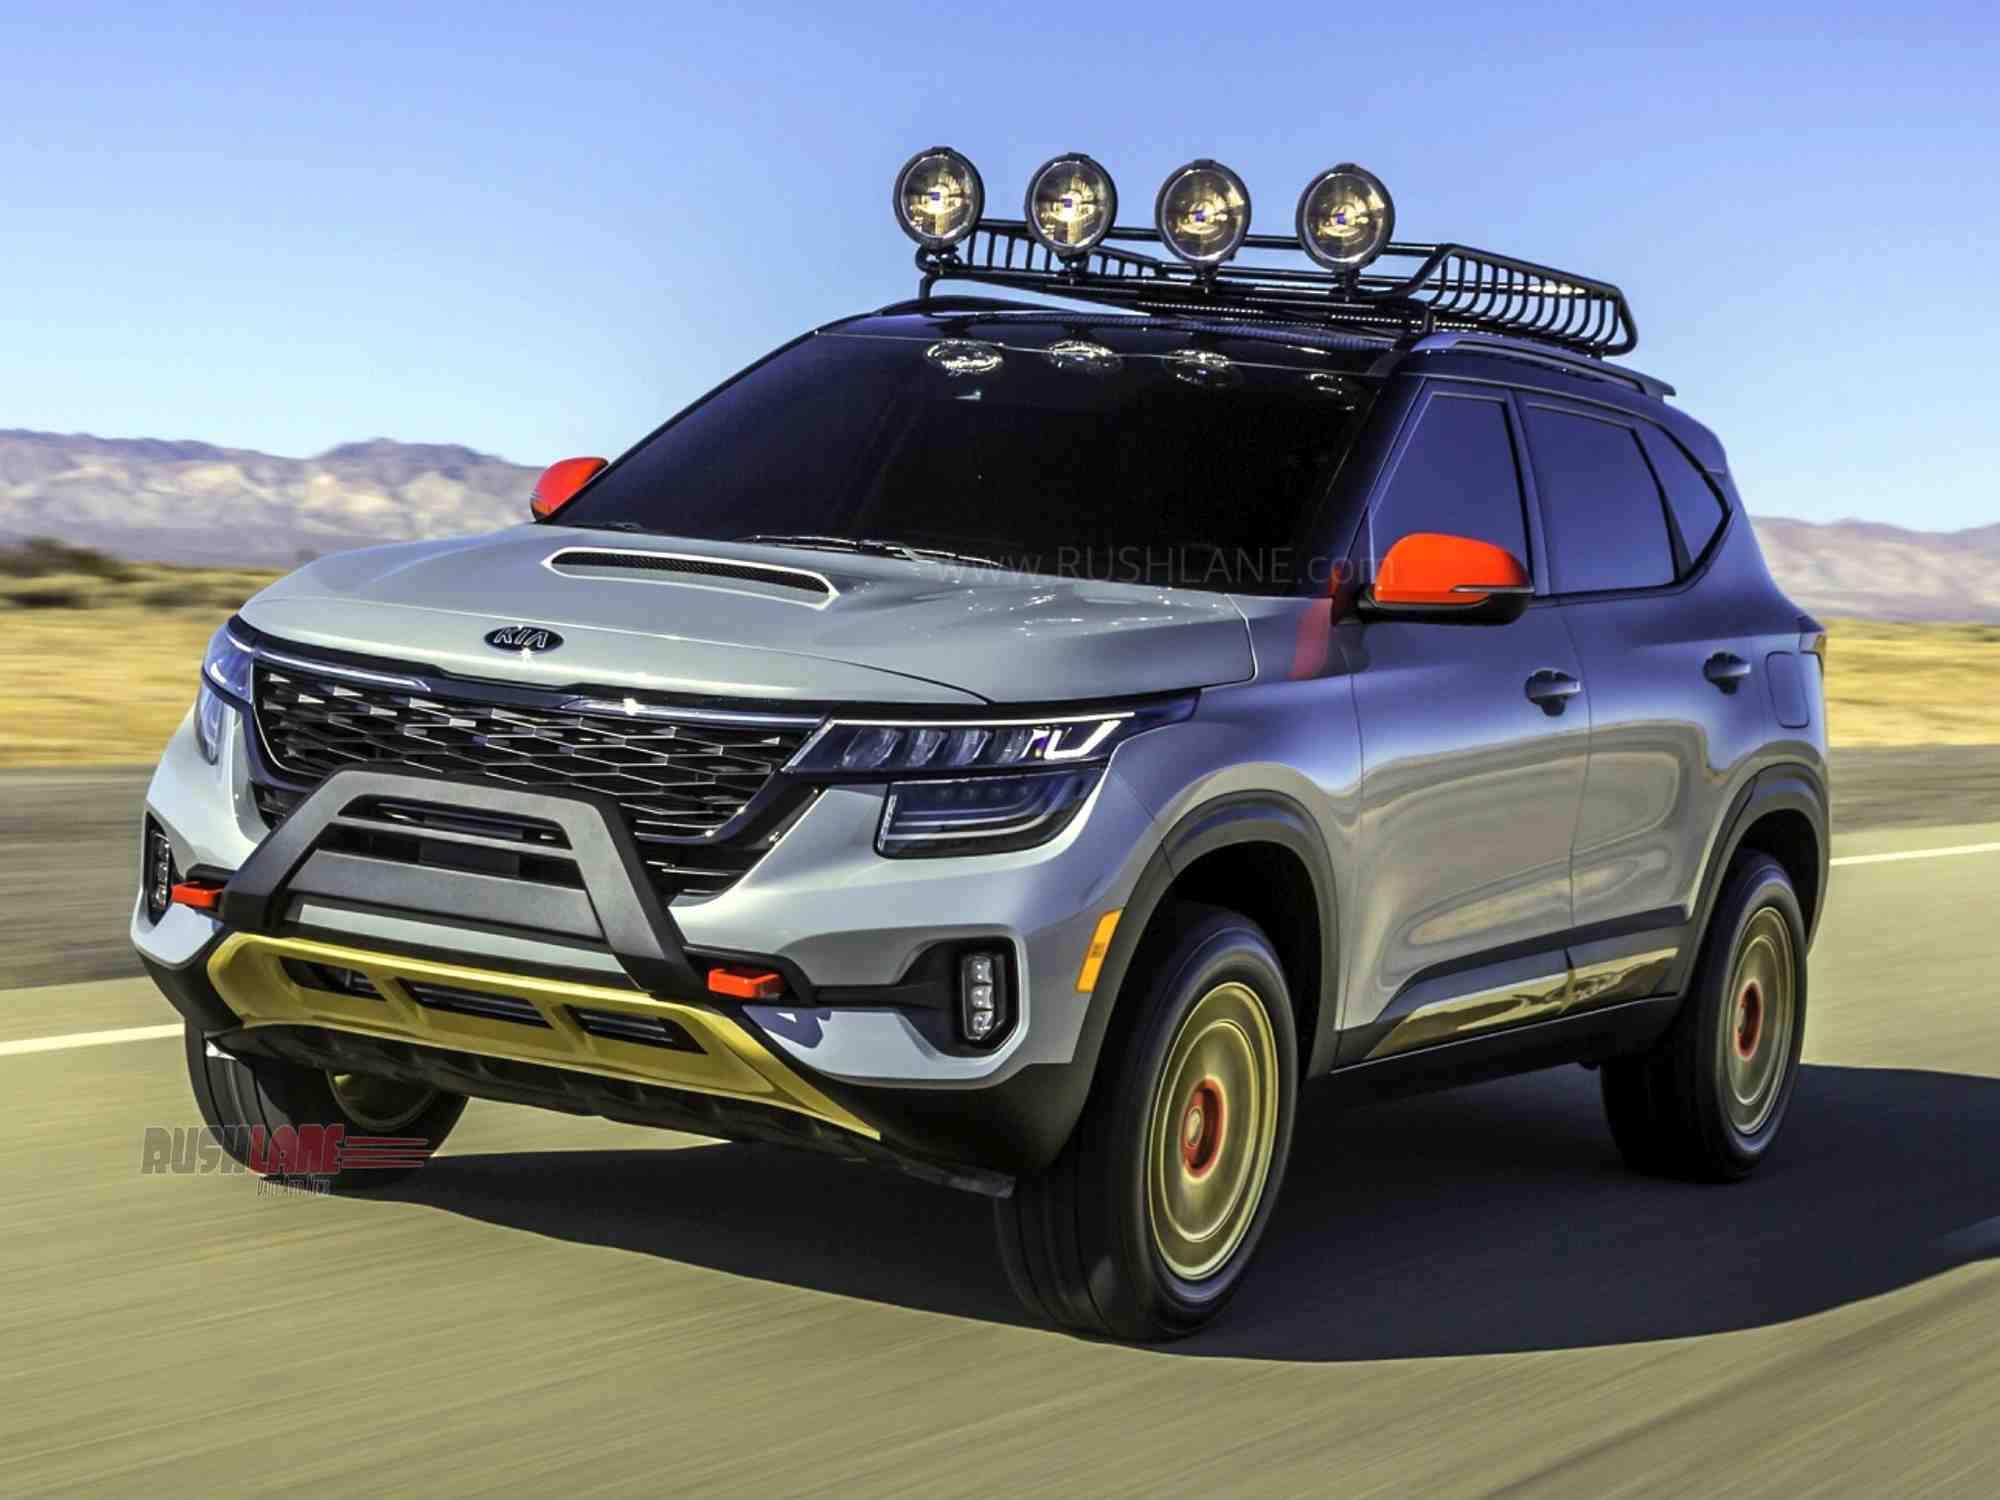 2020 Kia Seltos X-Line Trail Attack and Urban Concept unveiled